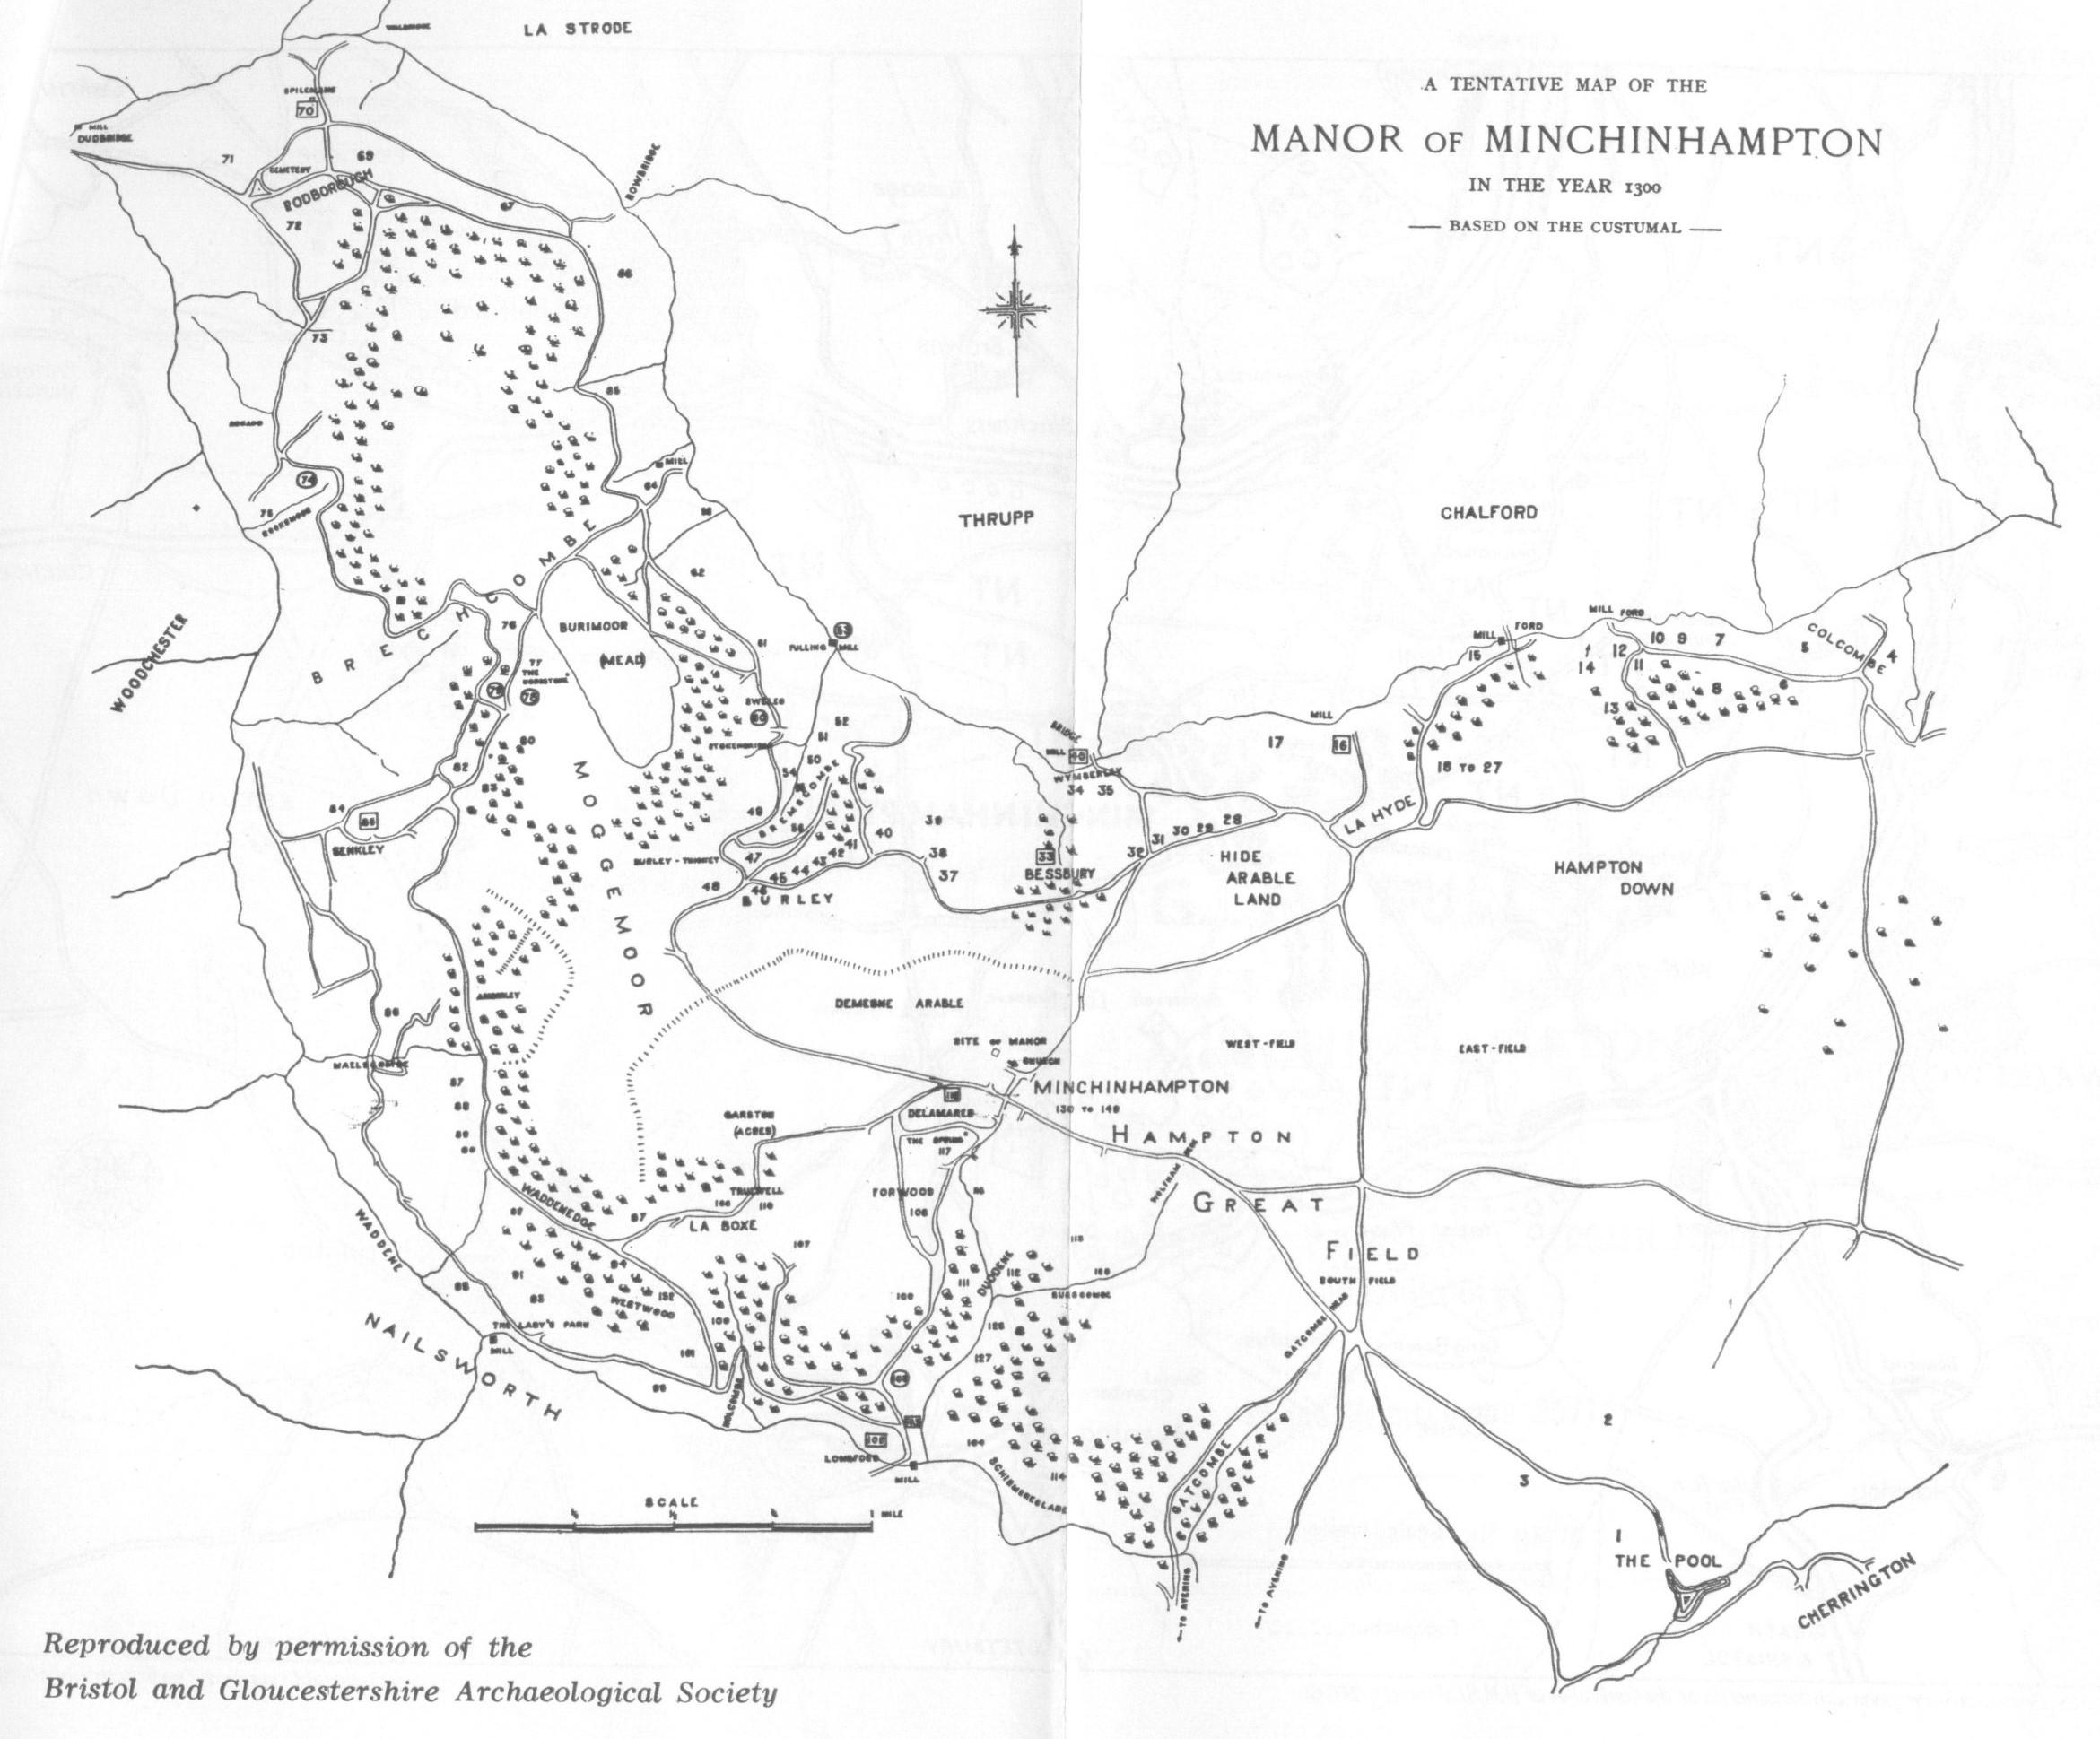 Map of the Manor of Minchinhampton - a possible interpretation